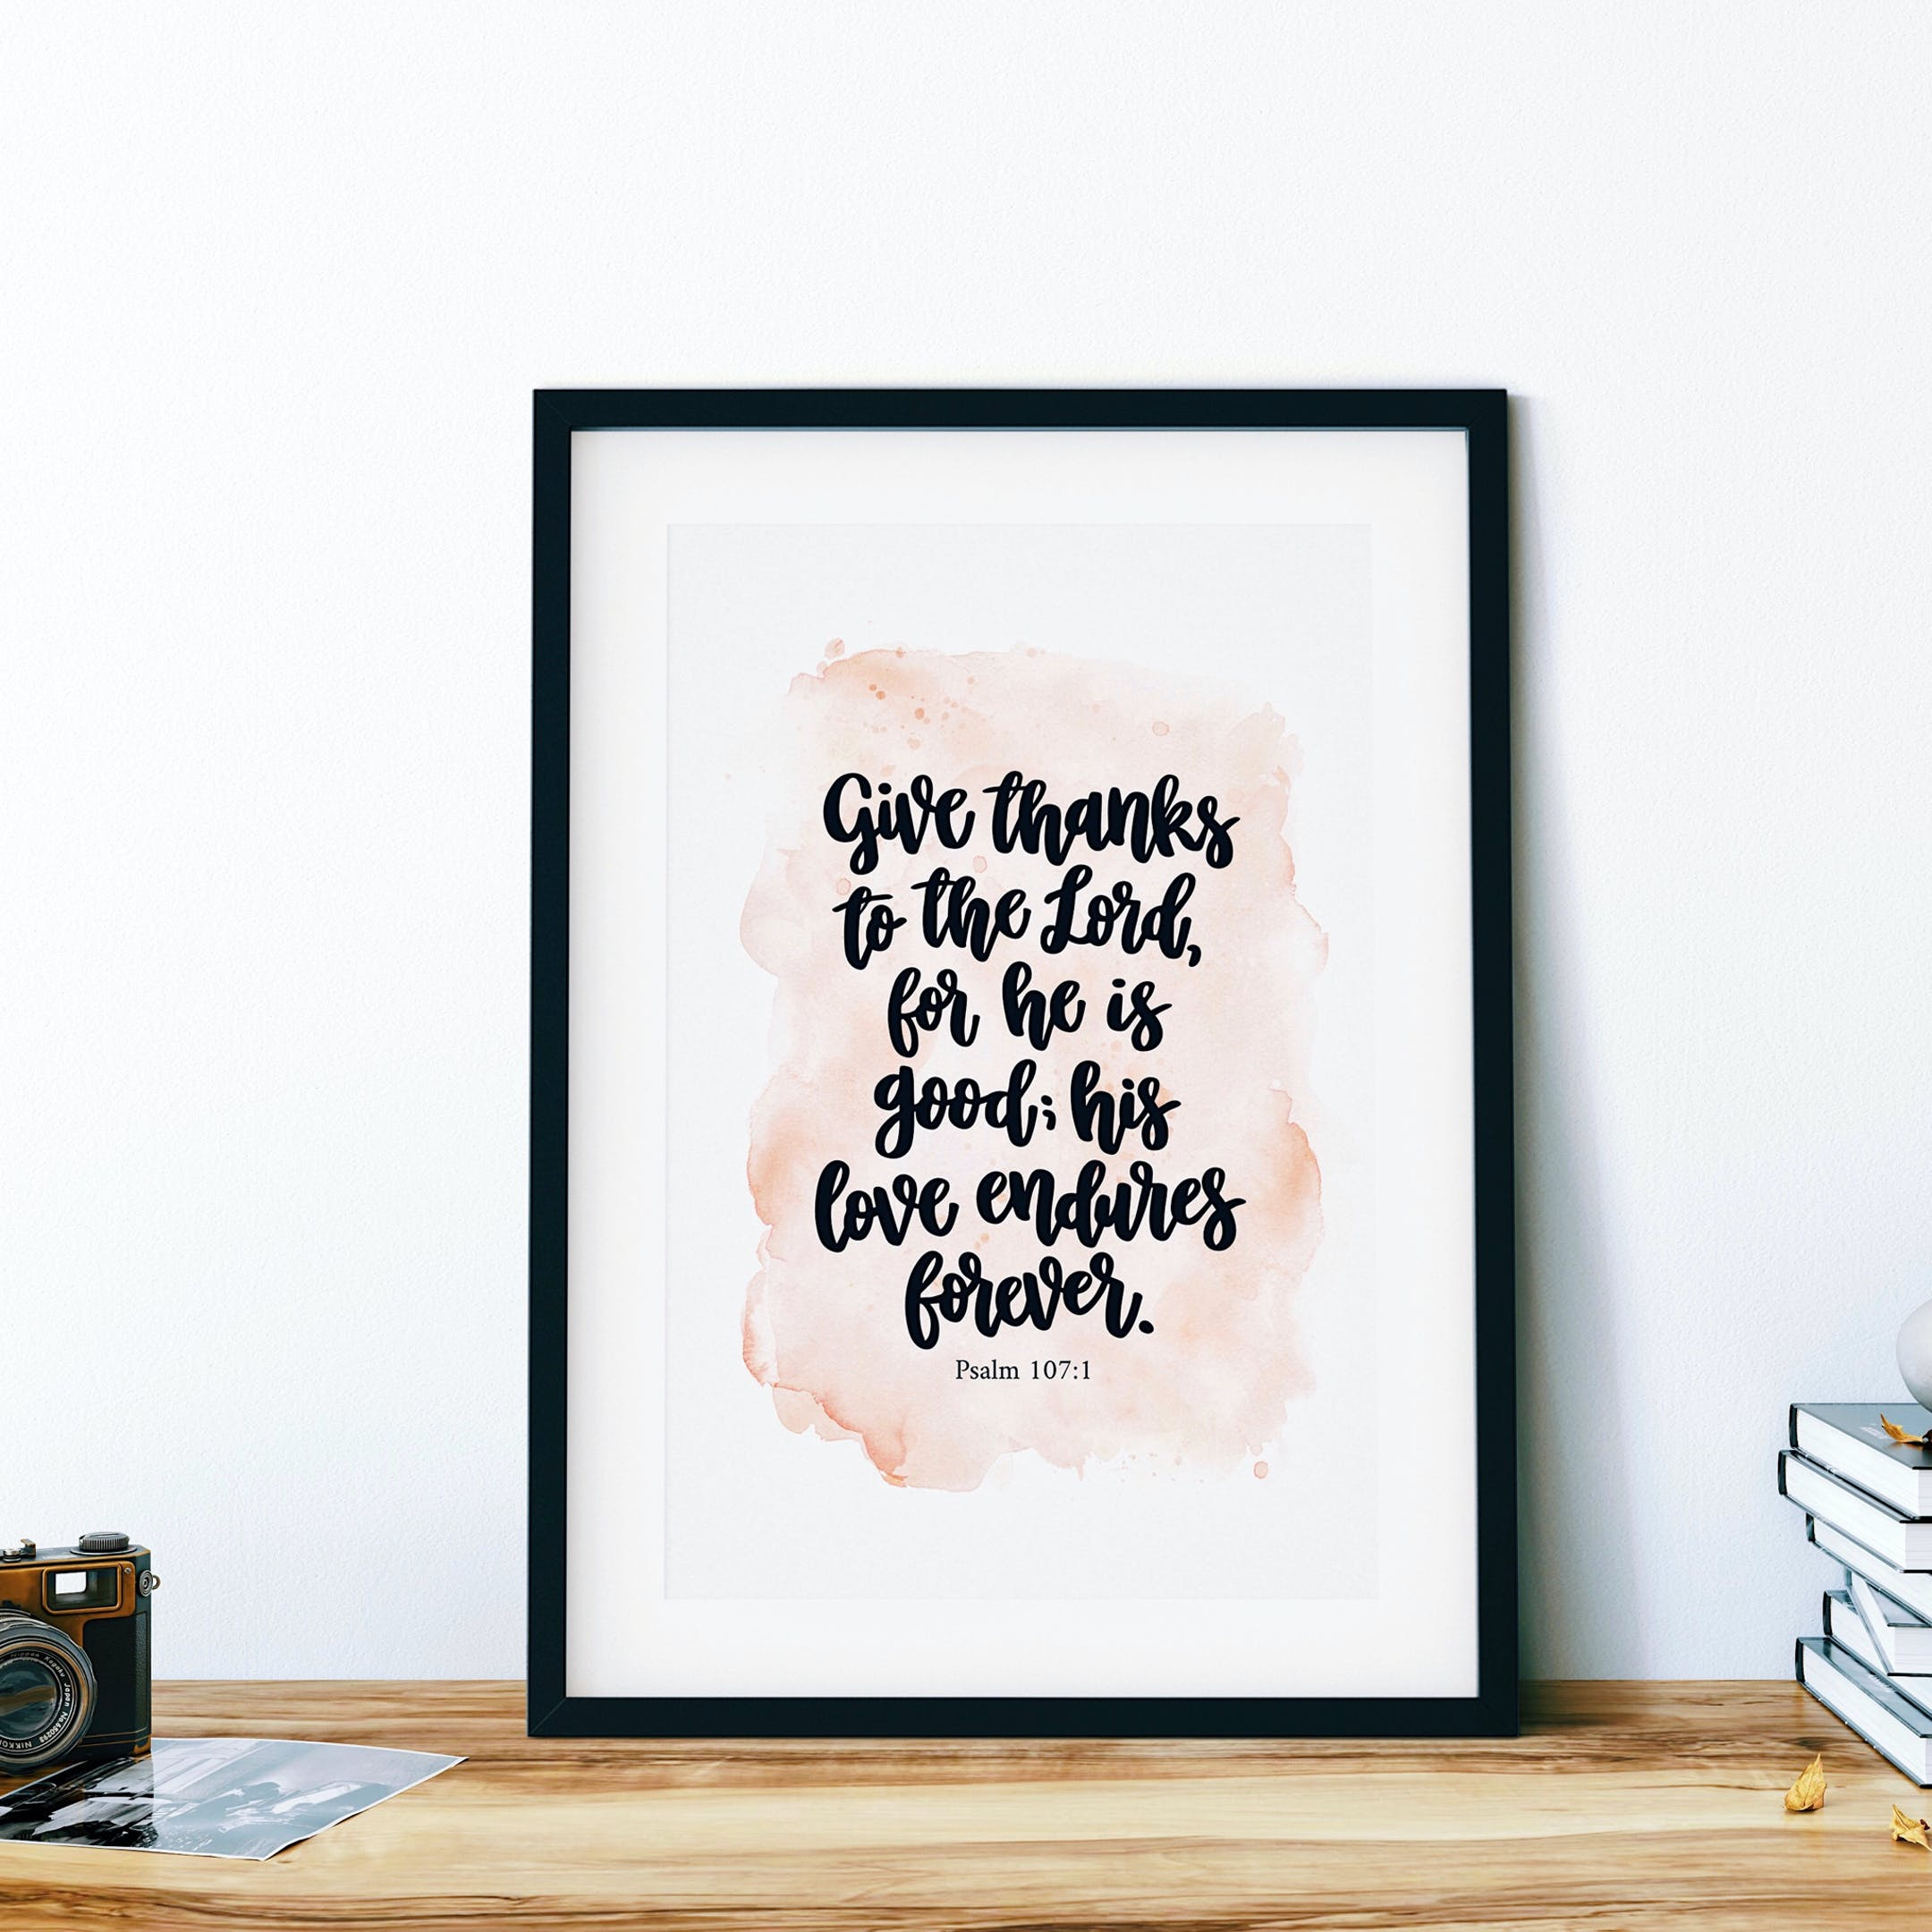 Give Thanks Print - Psalm 107:1 - Izzy & Pop